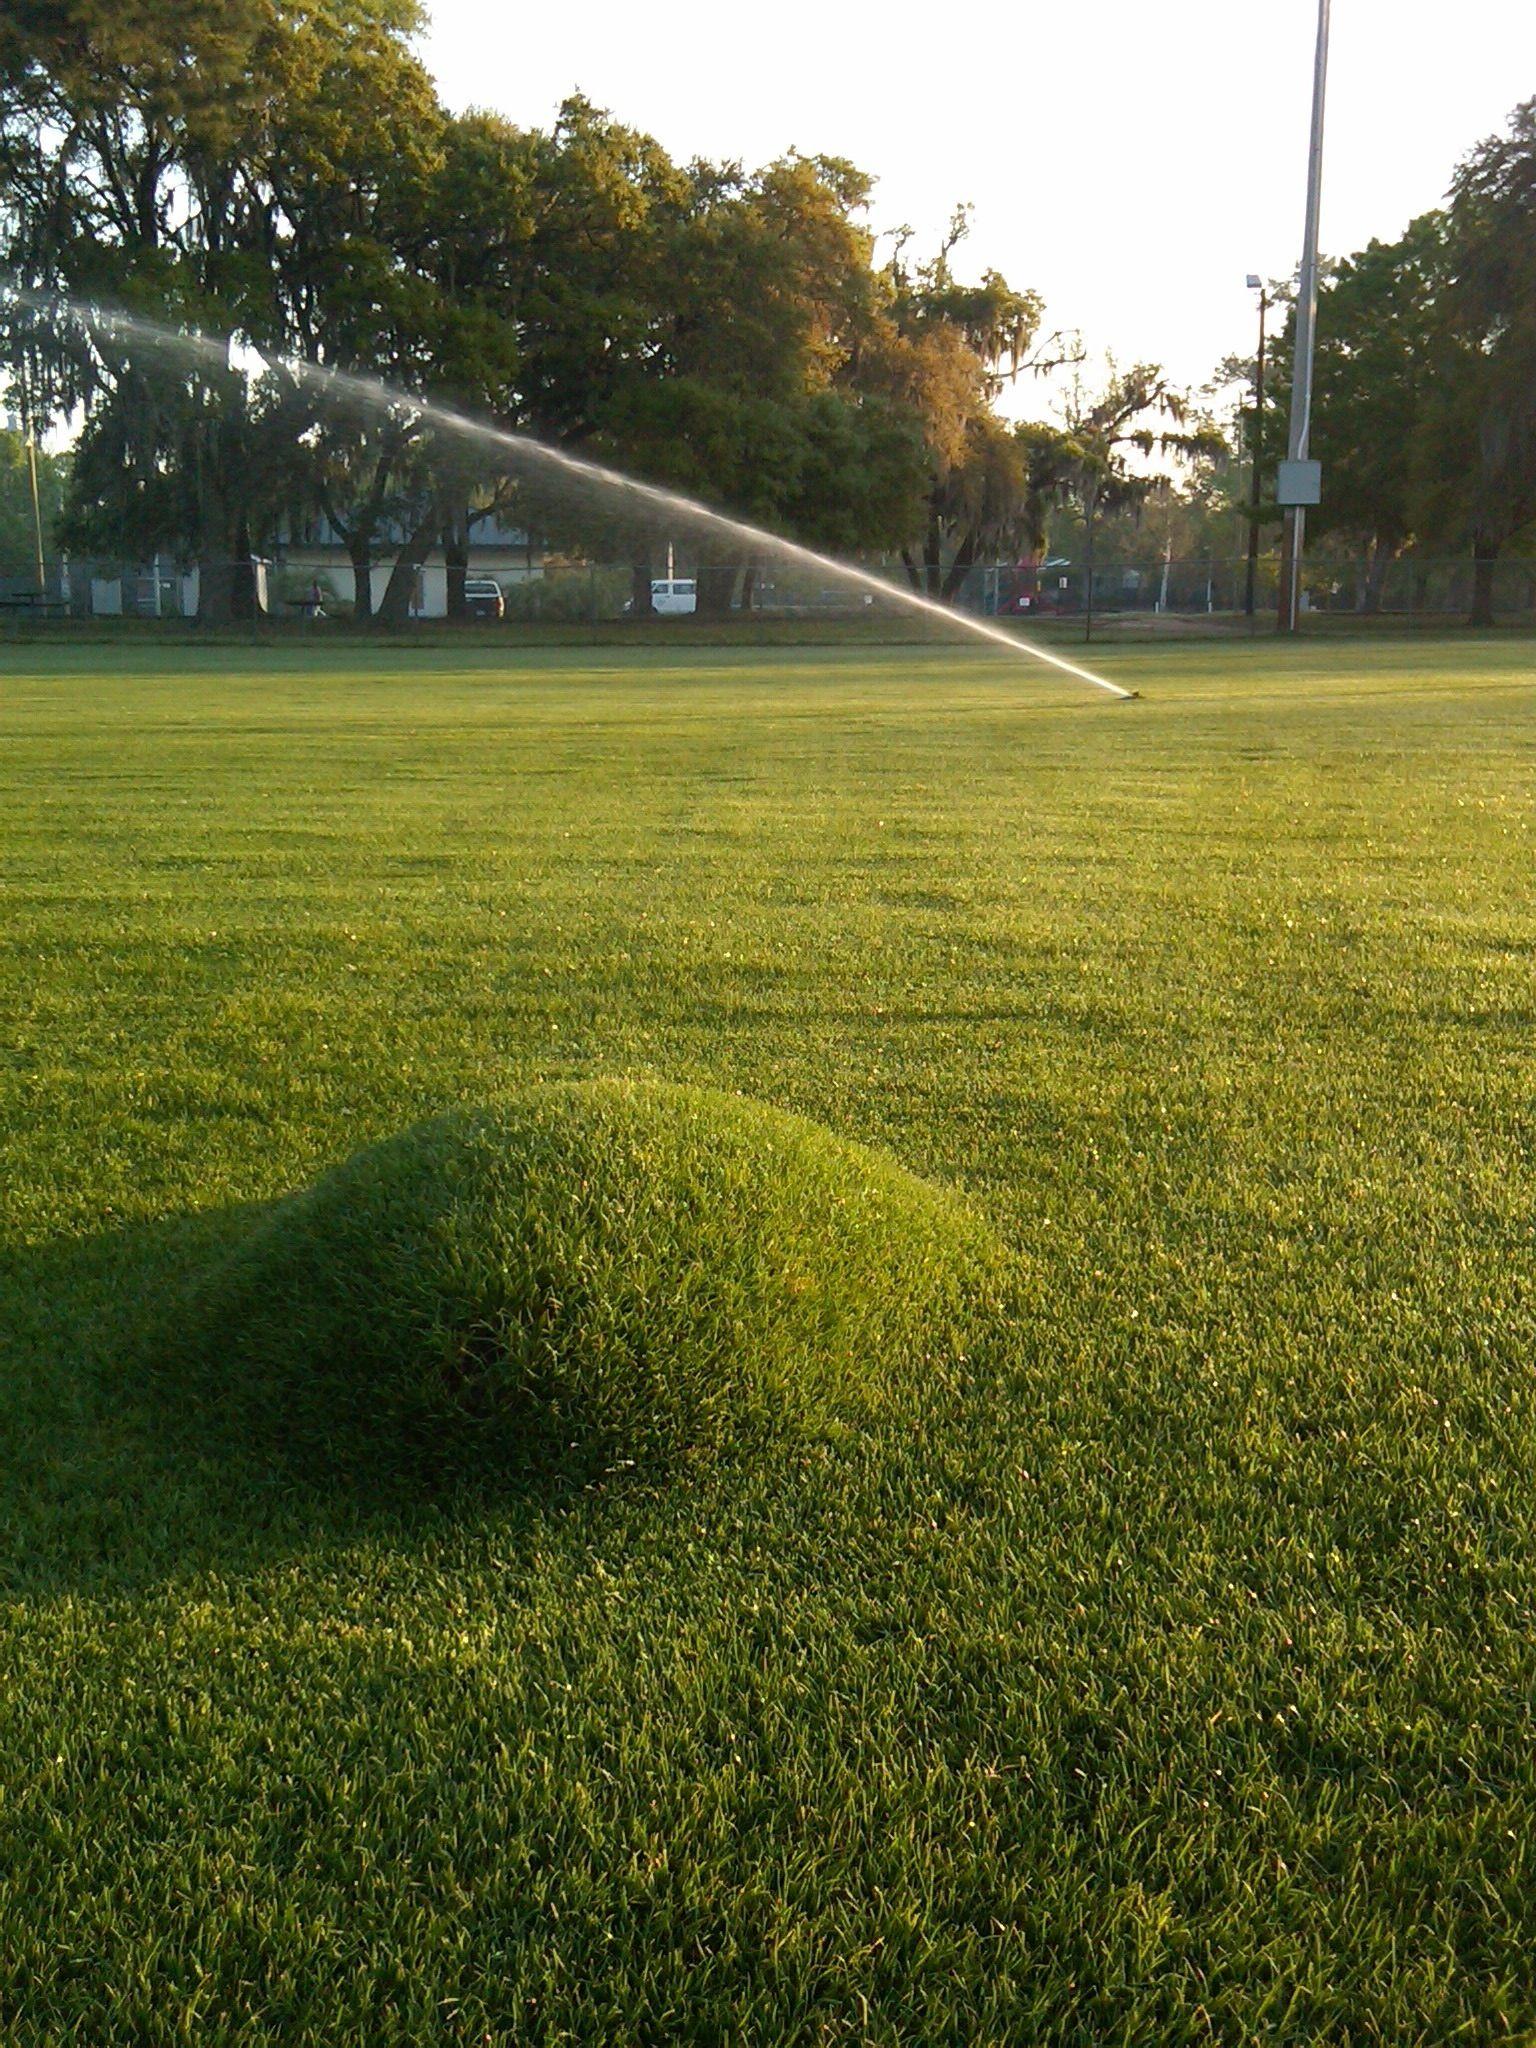 Earth blister. Sports turf, Turf, Golf courses